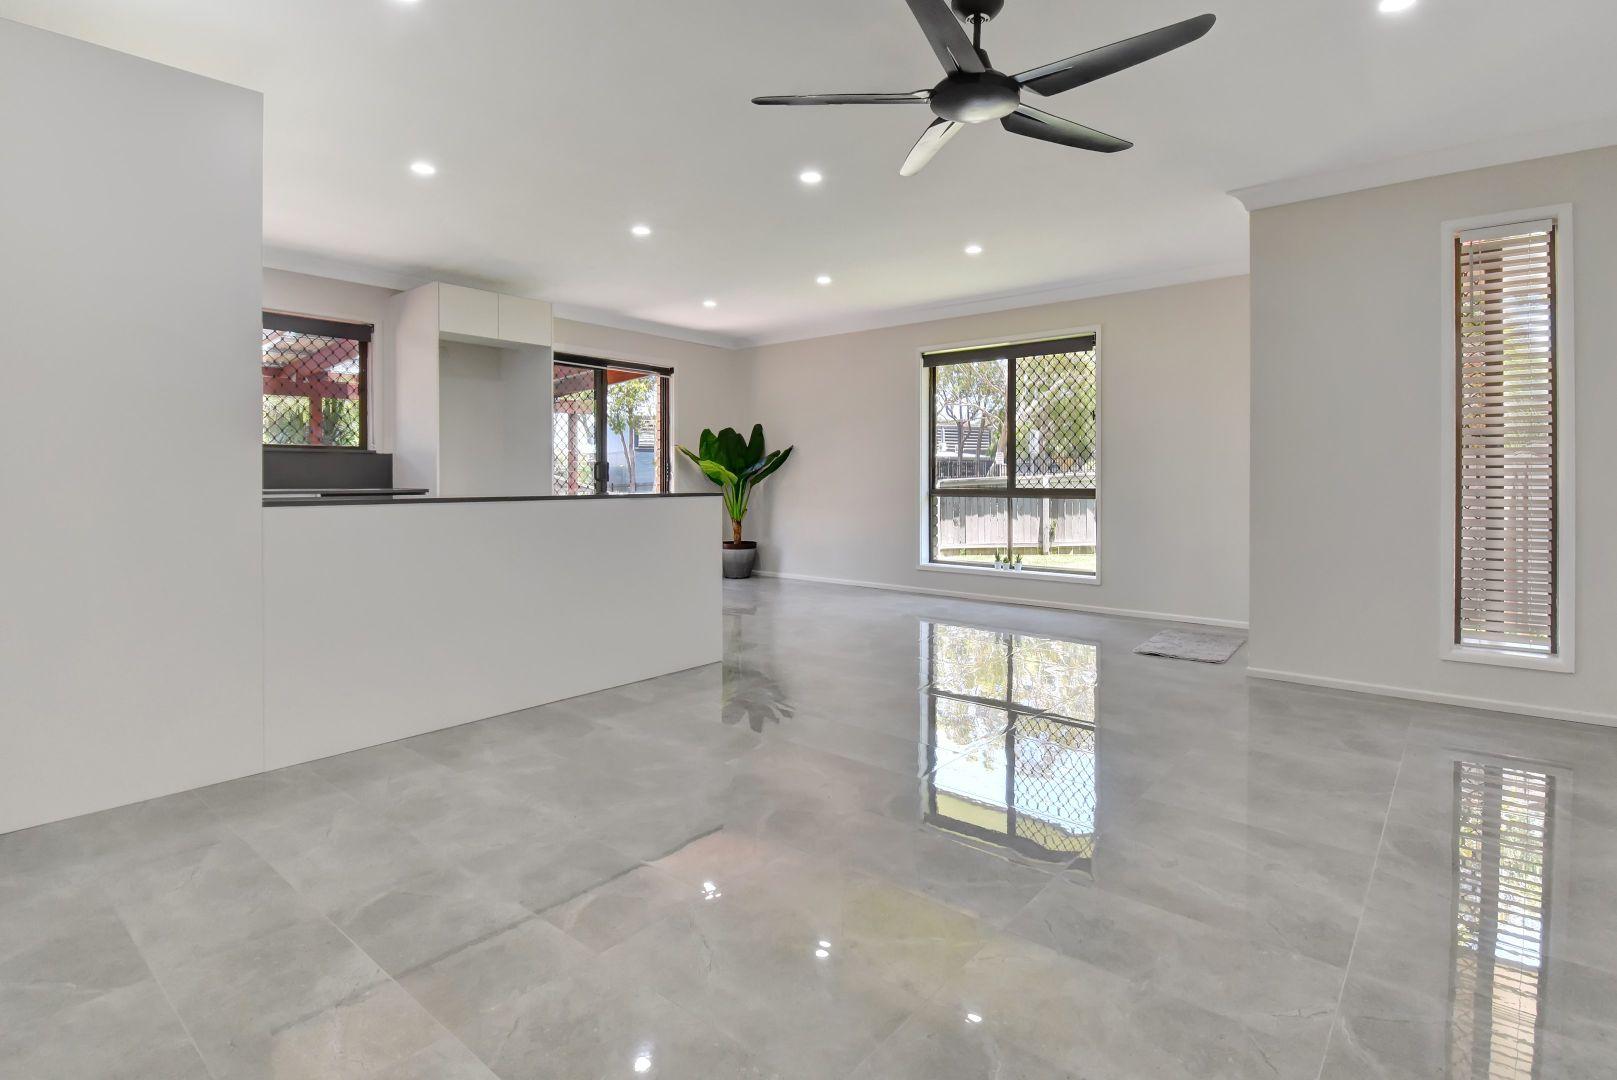 2/5 Bower Street, Caloundra QLD 4551, Image 1